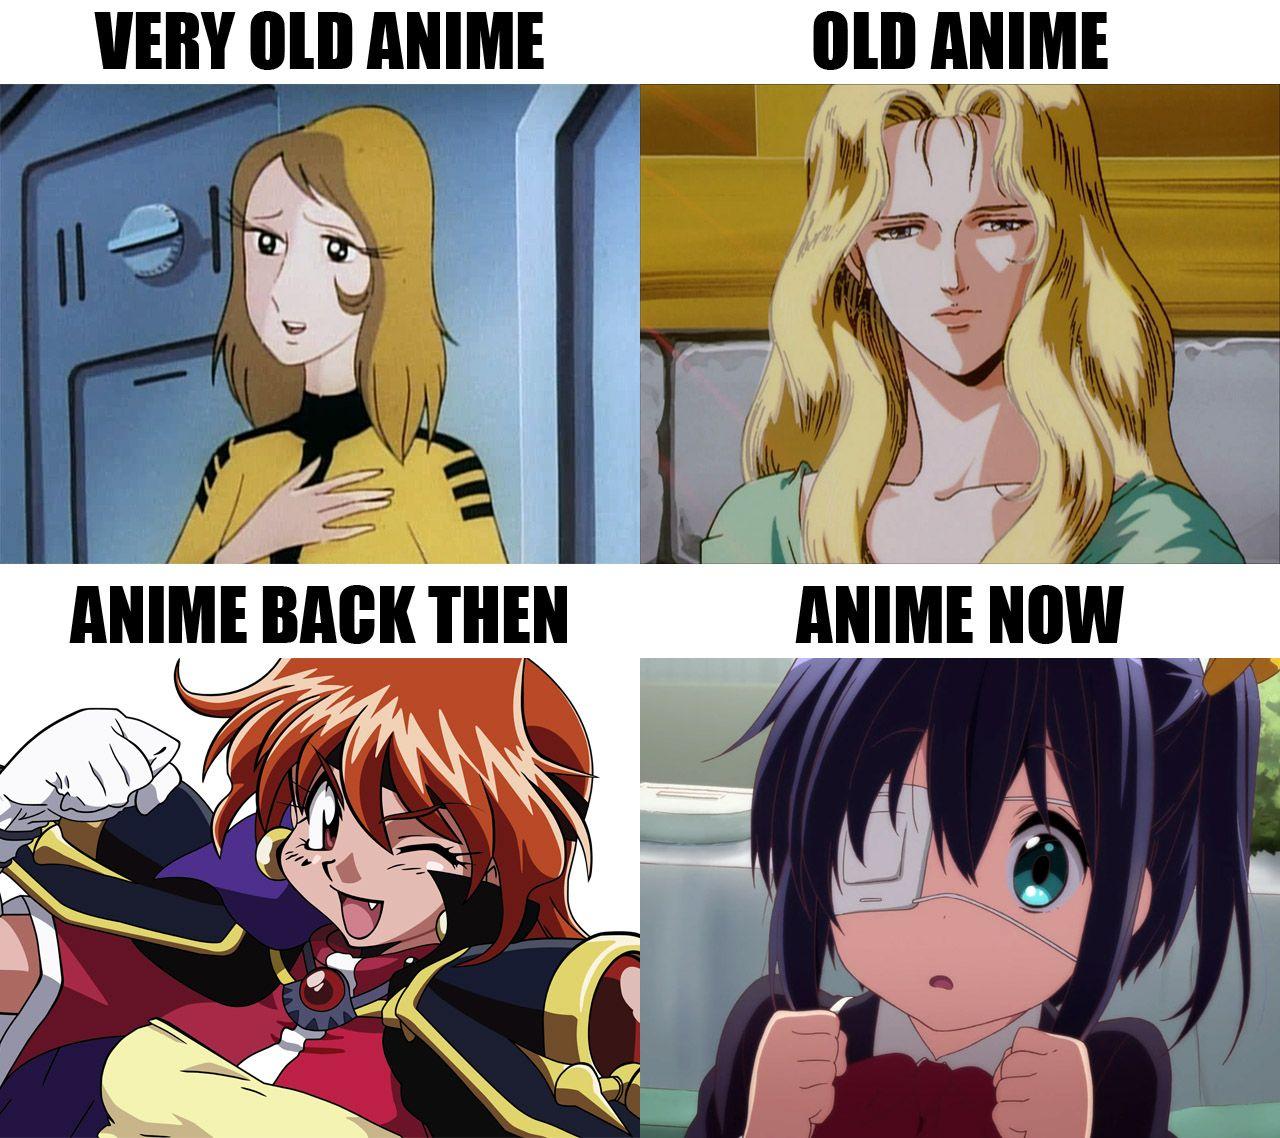 Old Anime Anime Old Anime Anime Memes Funny